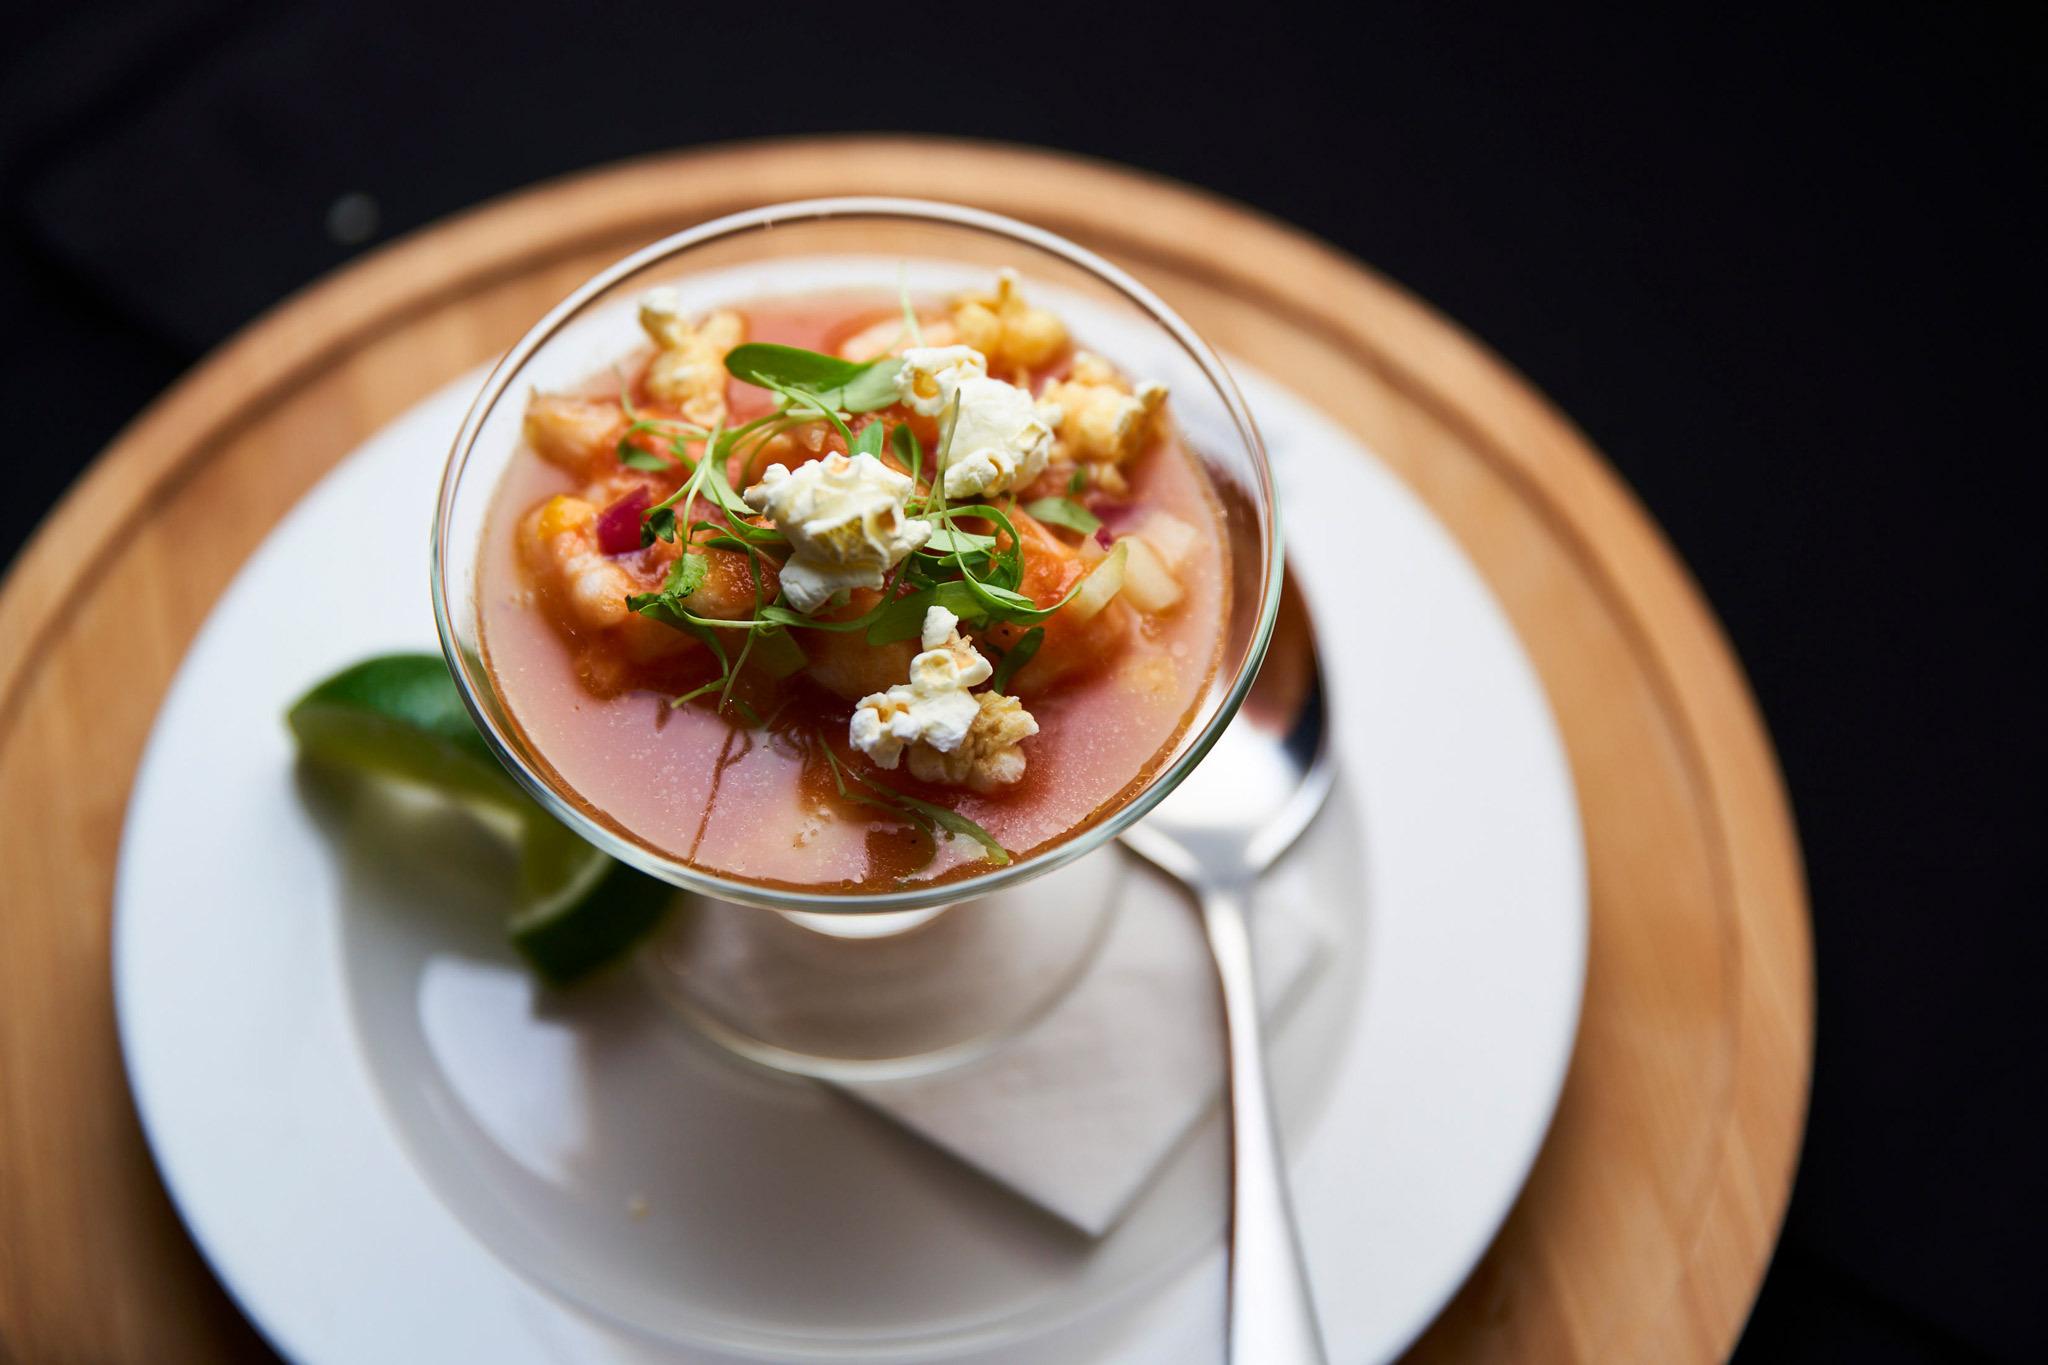 Food Envy: Norman Van Aken's shrimp ceviche